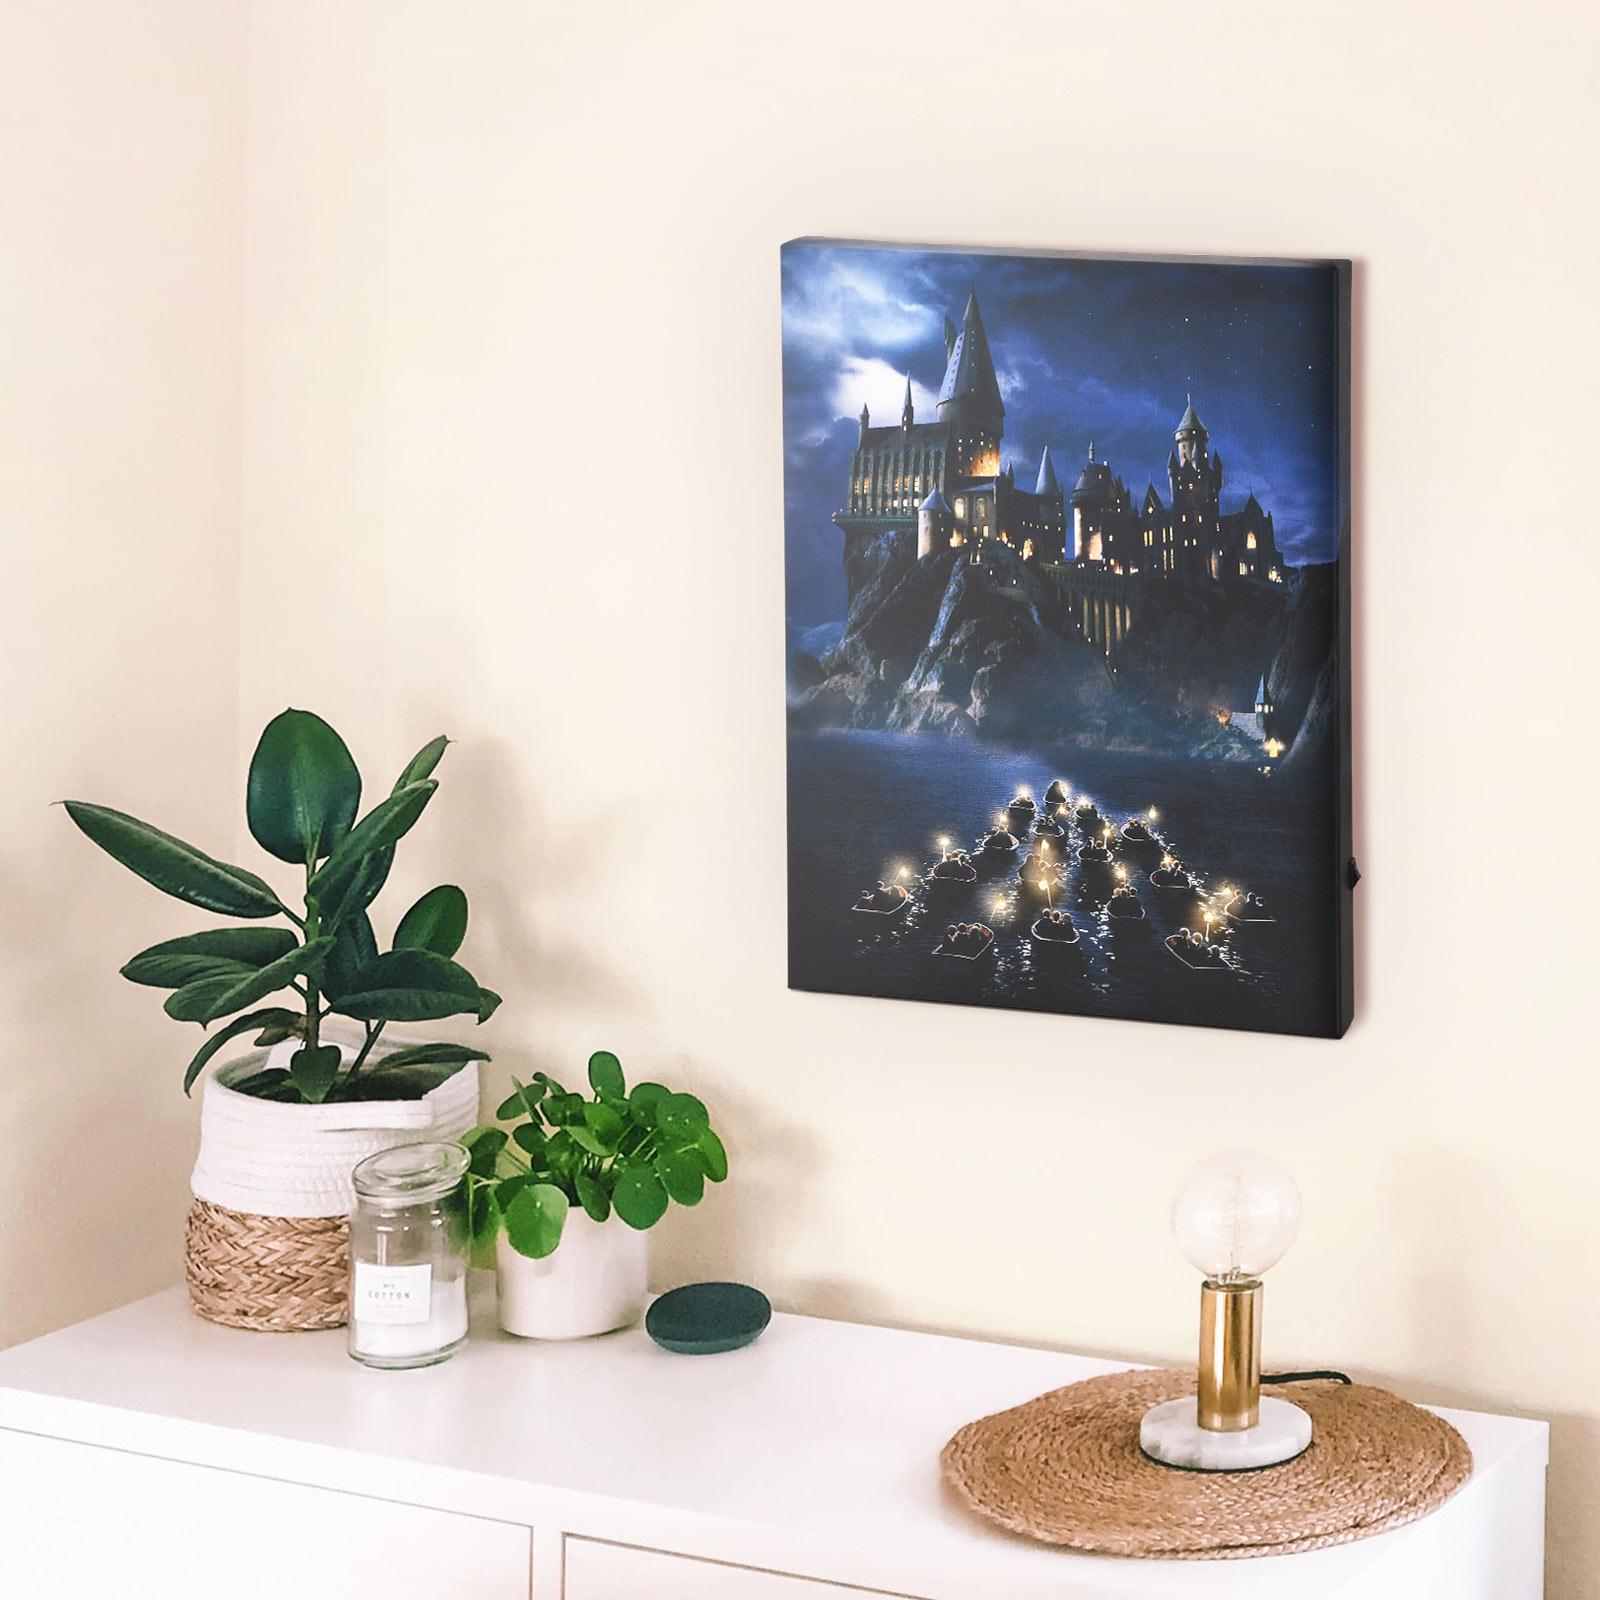 Harry Potter - Hogwarts Wandbild mit Licht